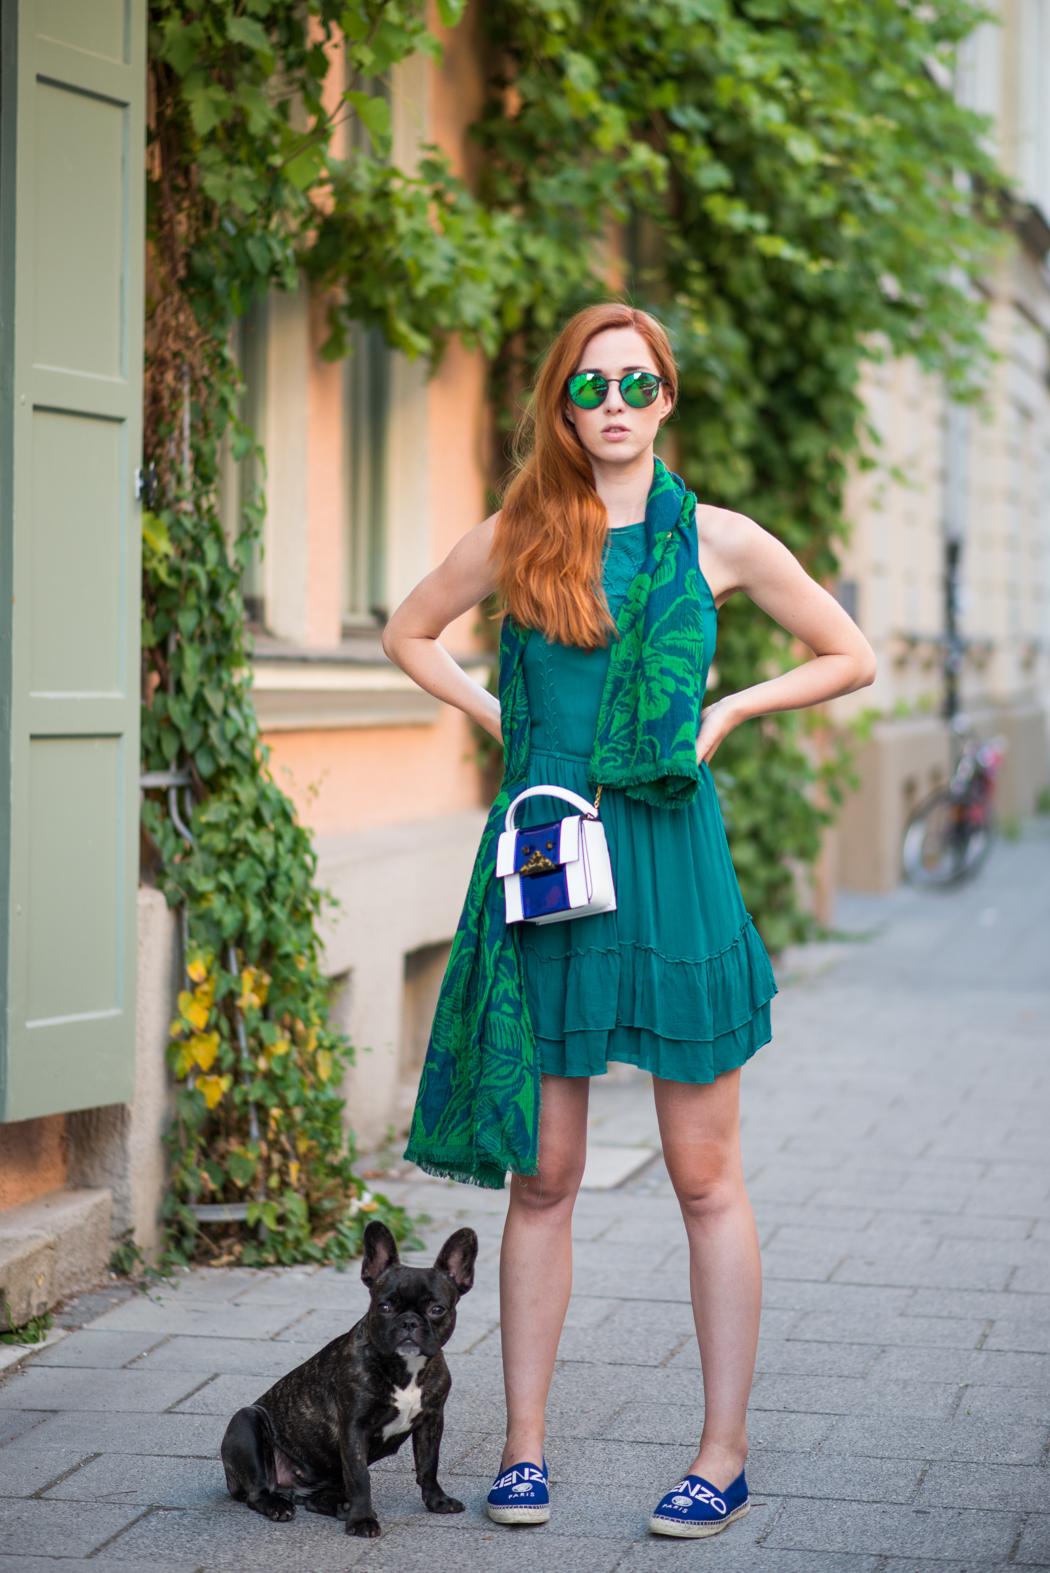 Fashionblog-Fashionblogger-Fashion-Blog-Lifestyle-München-Deutschland-Lindarella-Linda-Rella-8